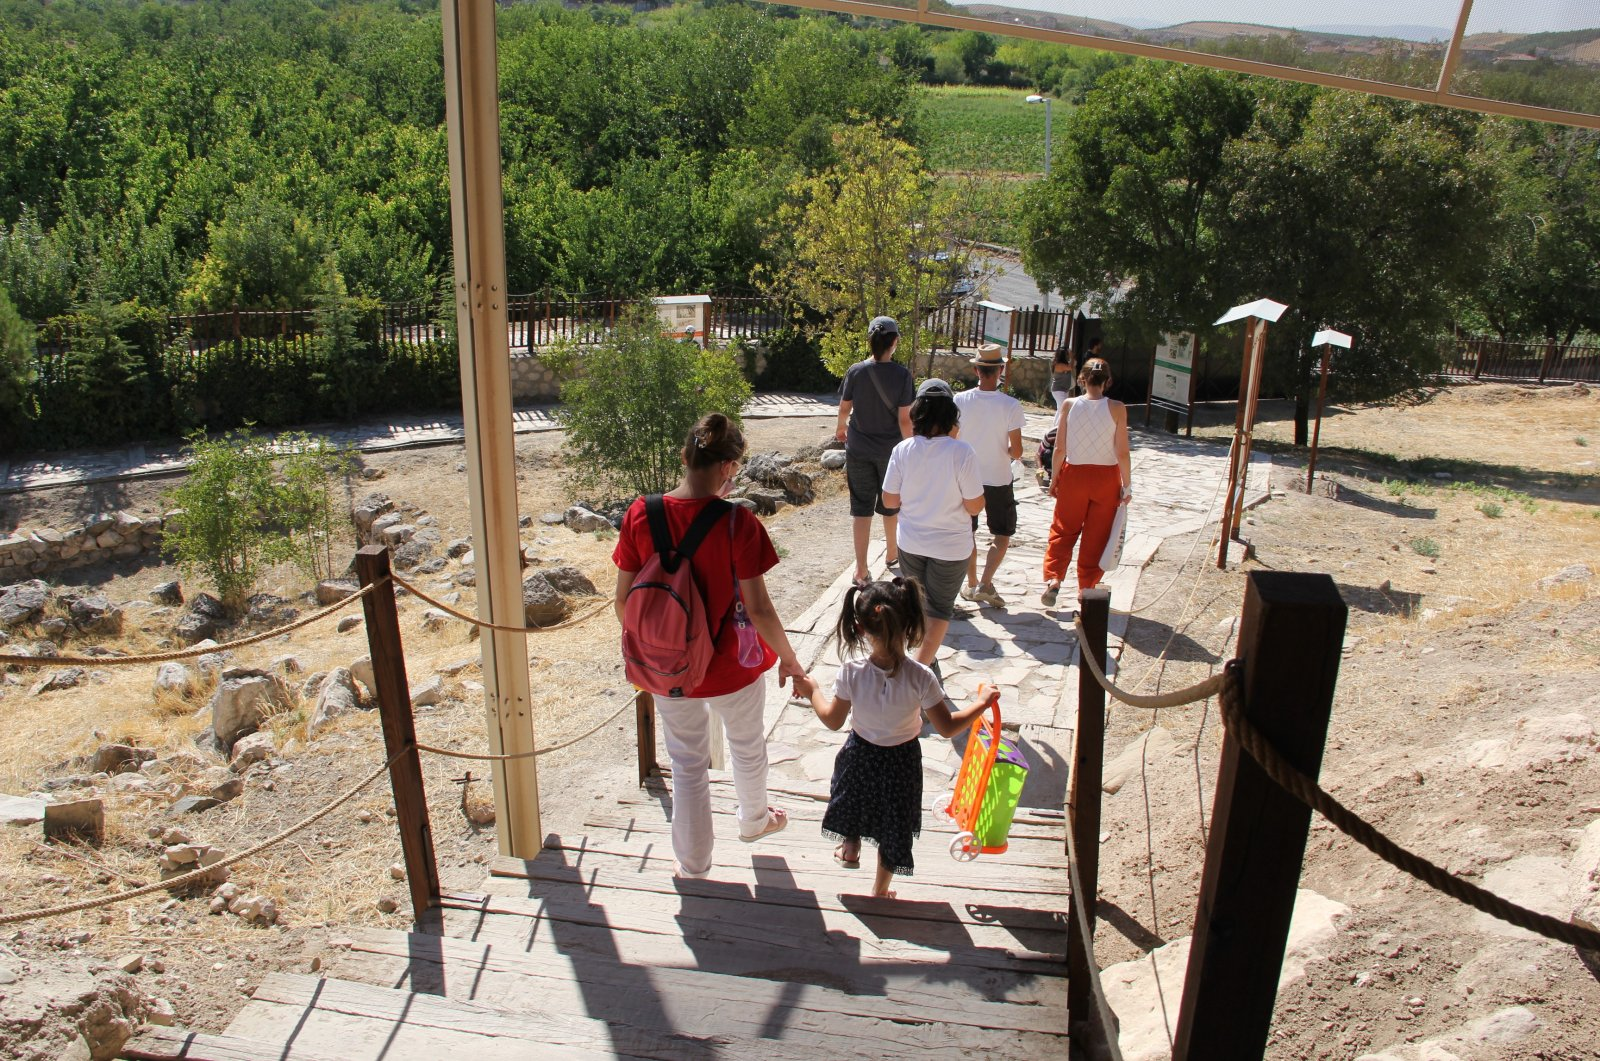 Tourists are seen entering the 7,000-year-old Arslantepe Mound archeological site, Malatya, eastern Turkey, Sept. 2, 2021. (Yeter Erdine / AA Photo)